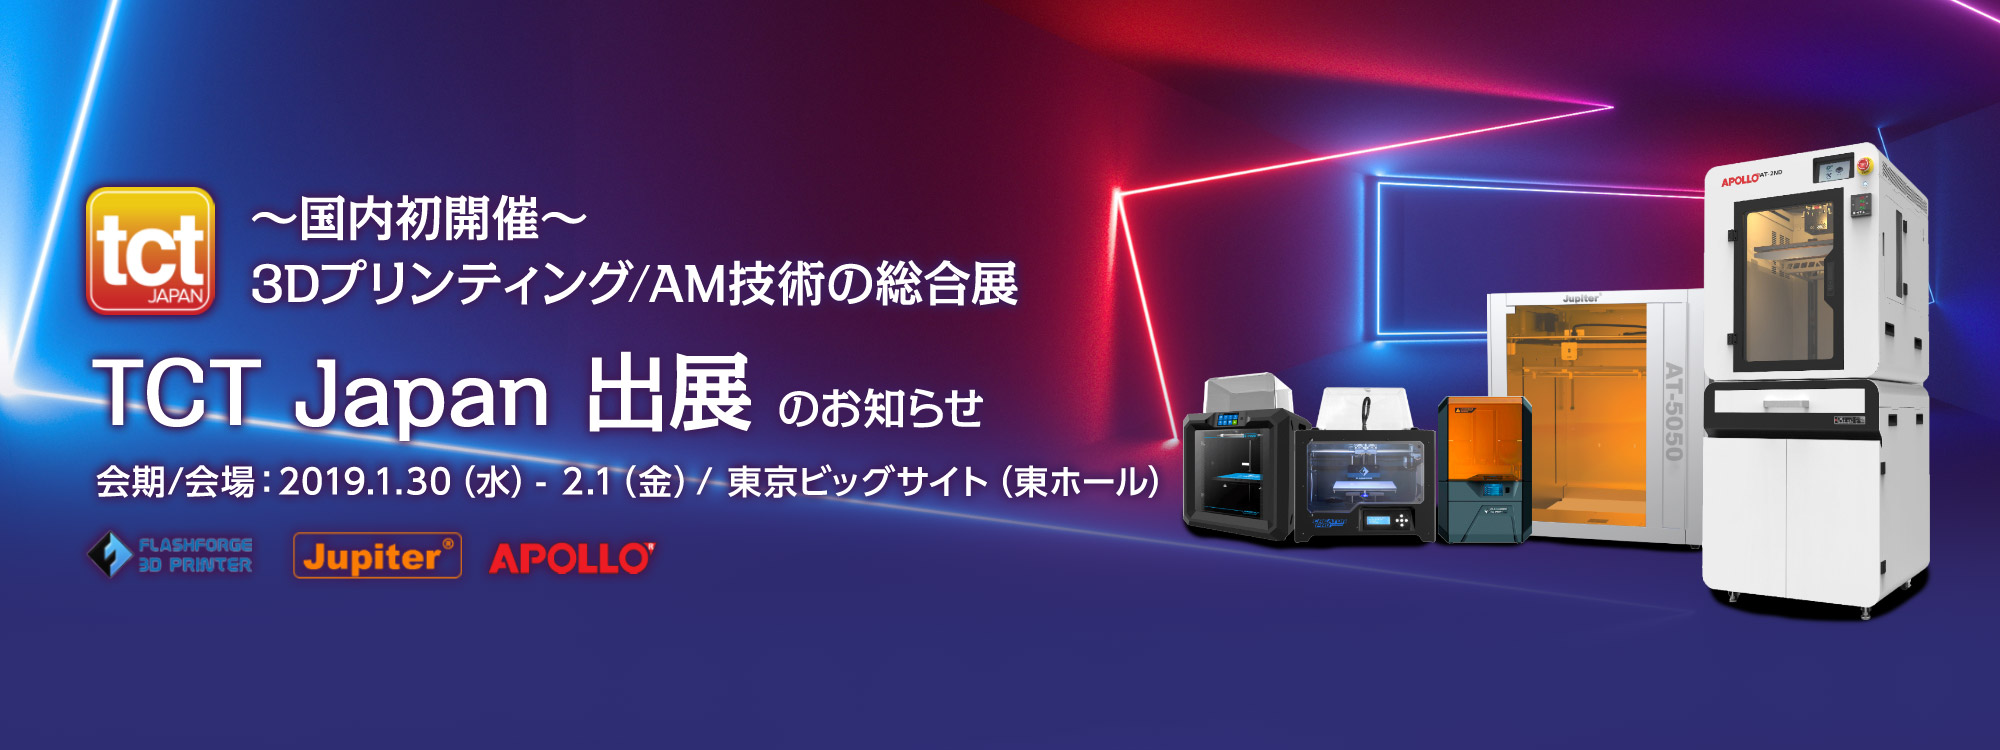 TCT Japan 出展 のお知らせ